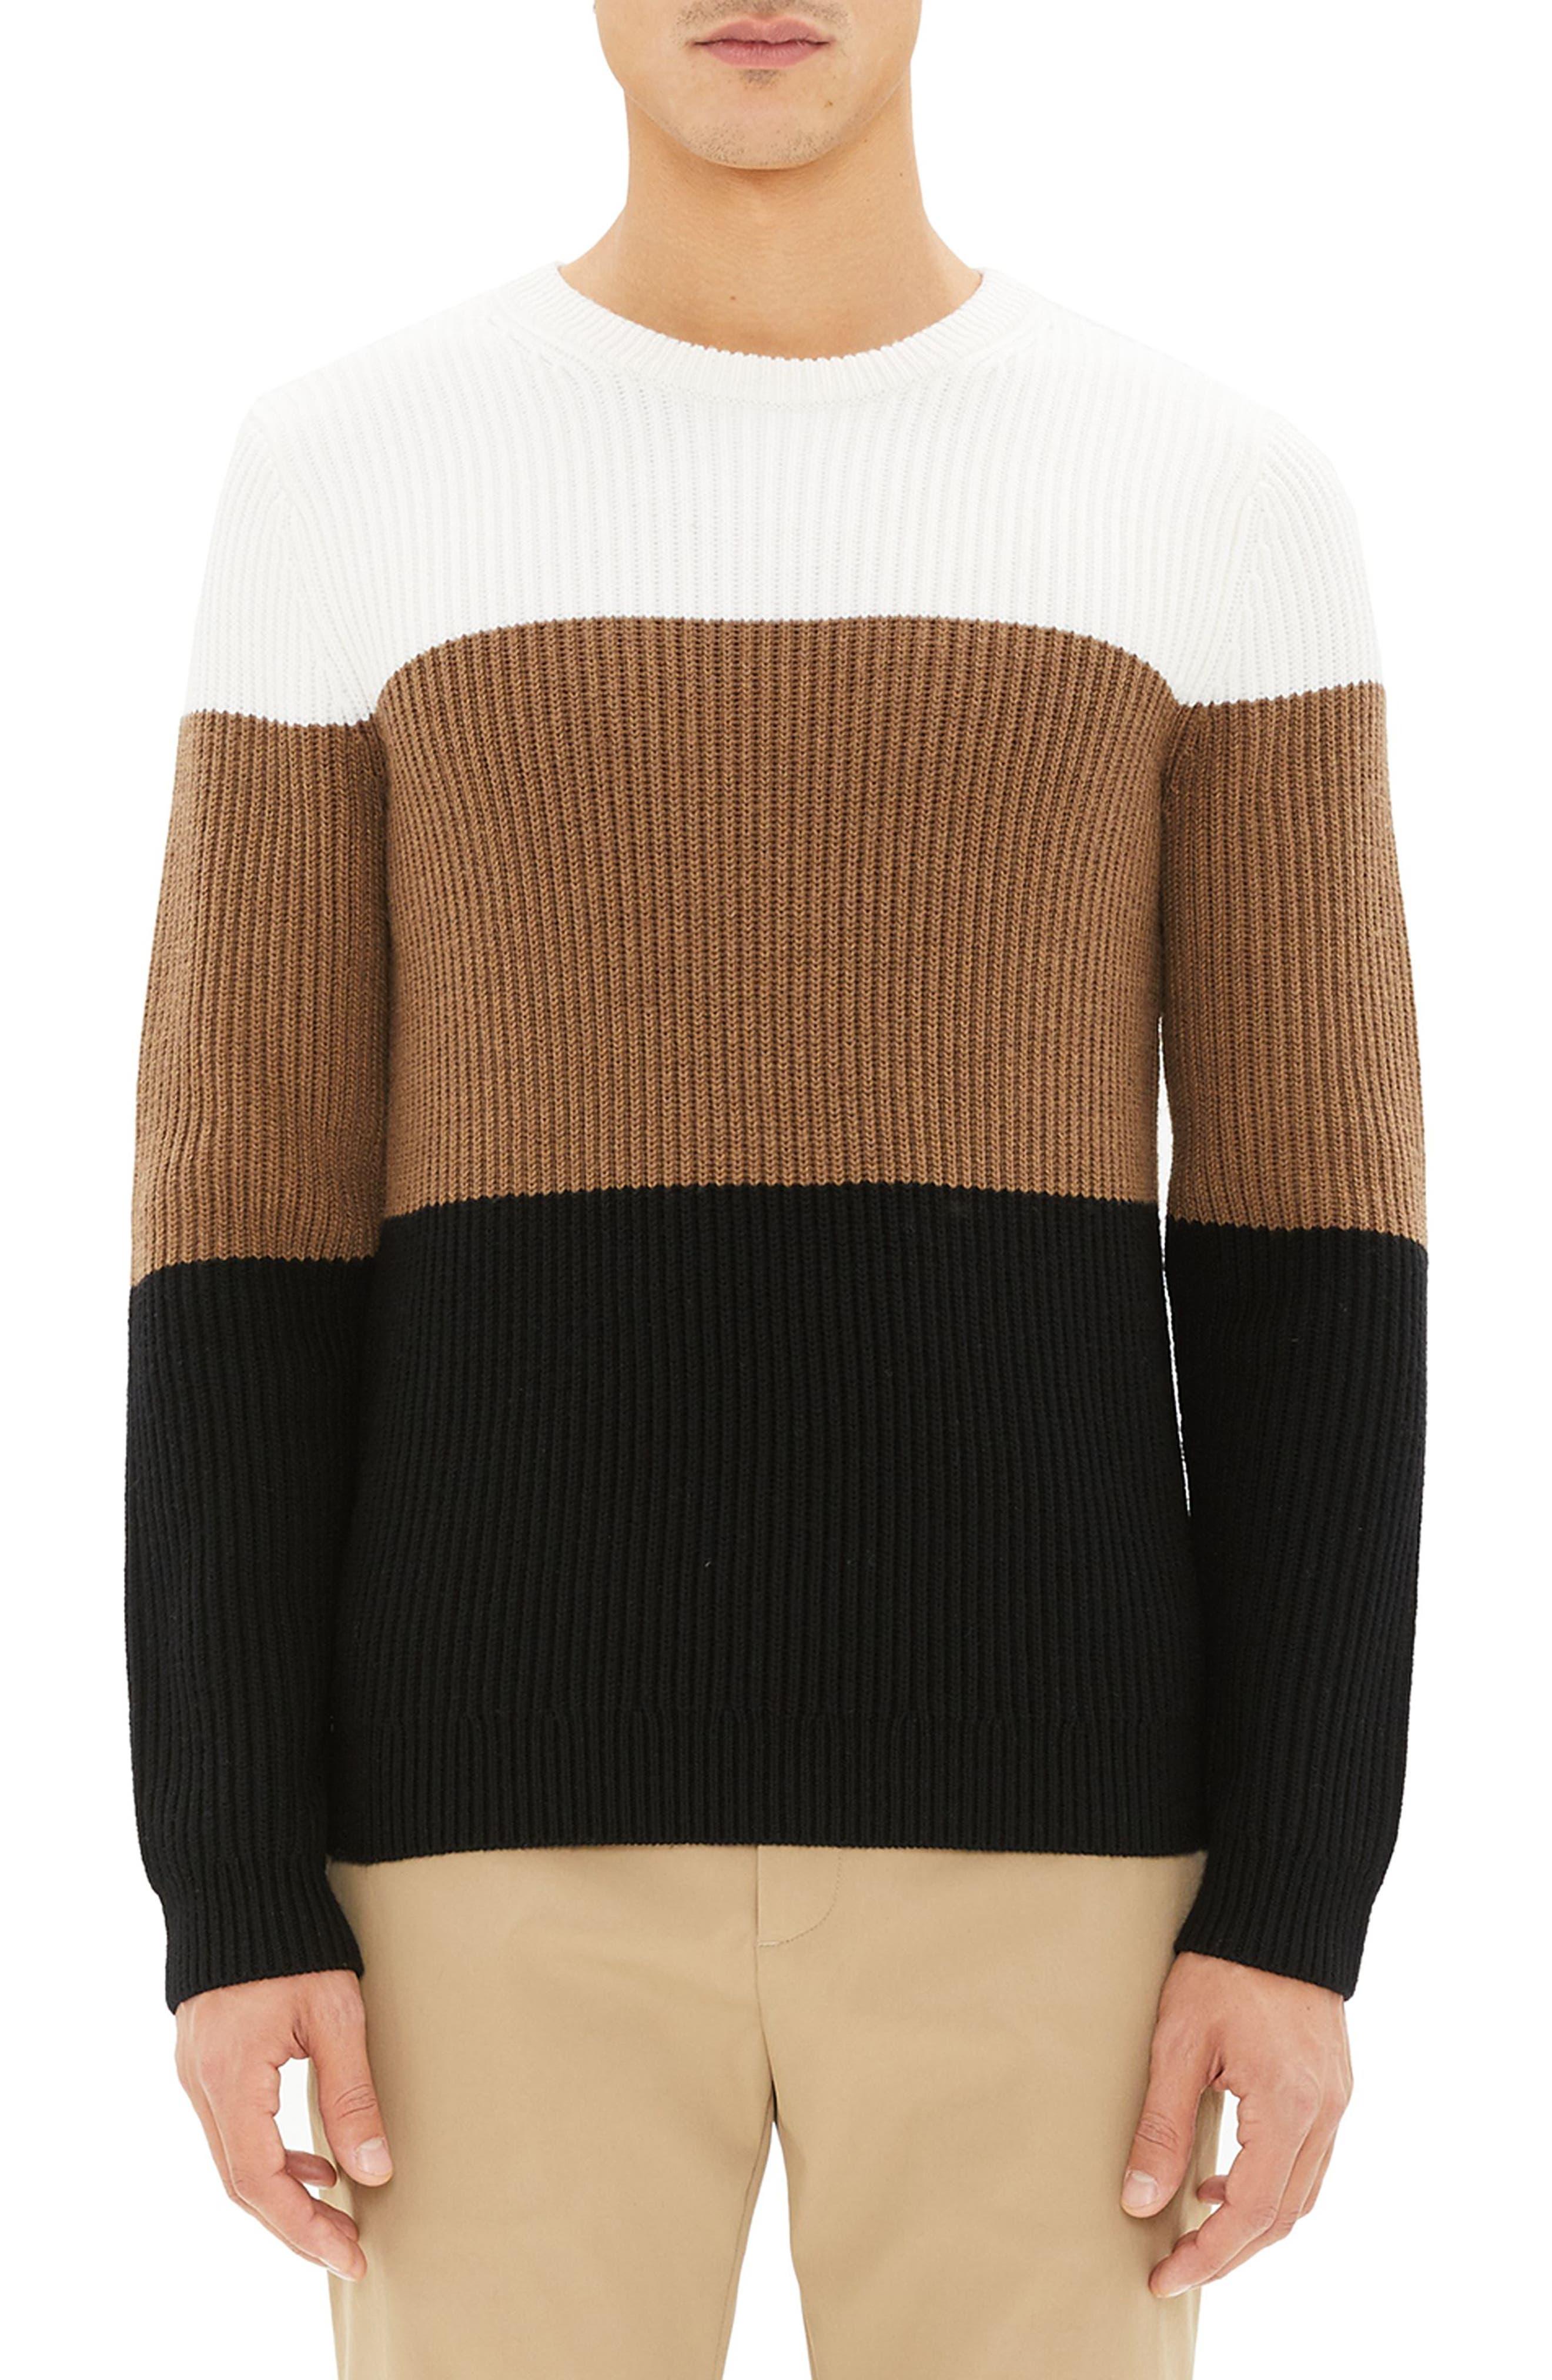 Romman Colorblock Merino Wool Sweater,                             Main thumbnail 1, color,                             110